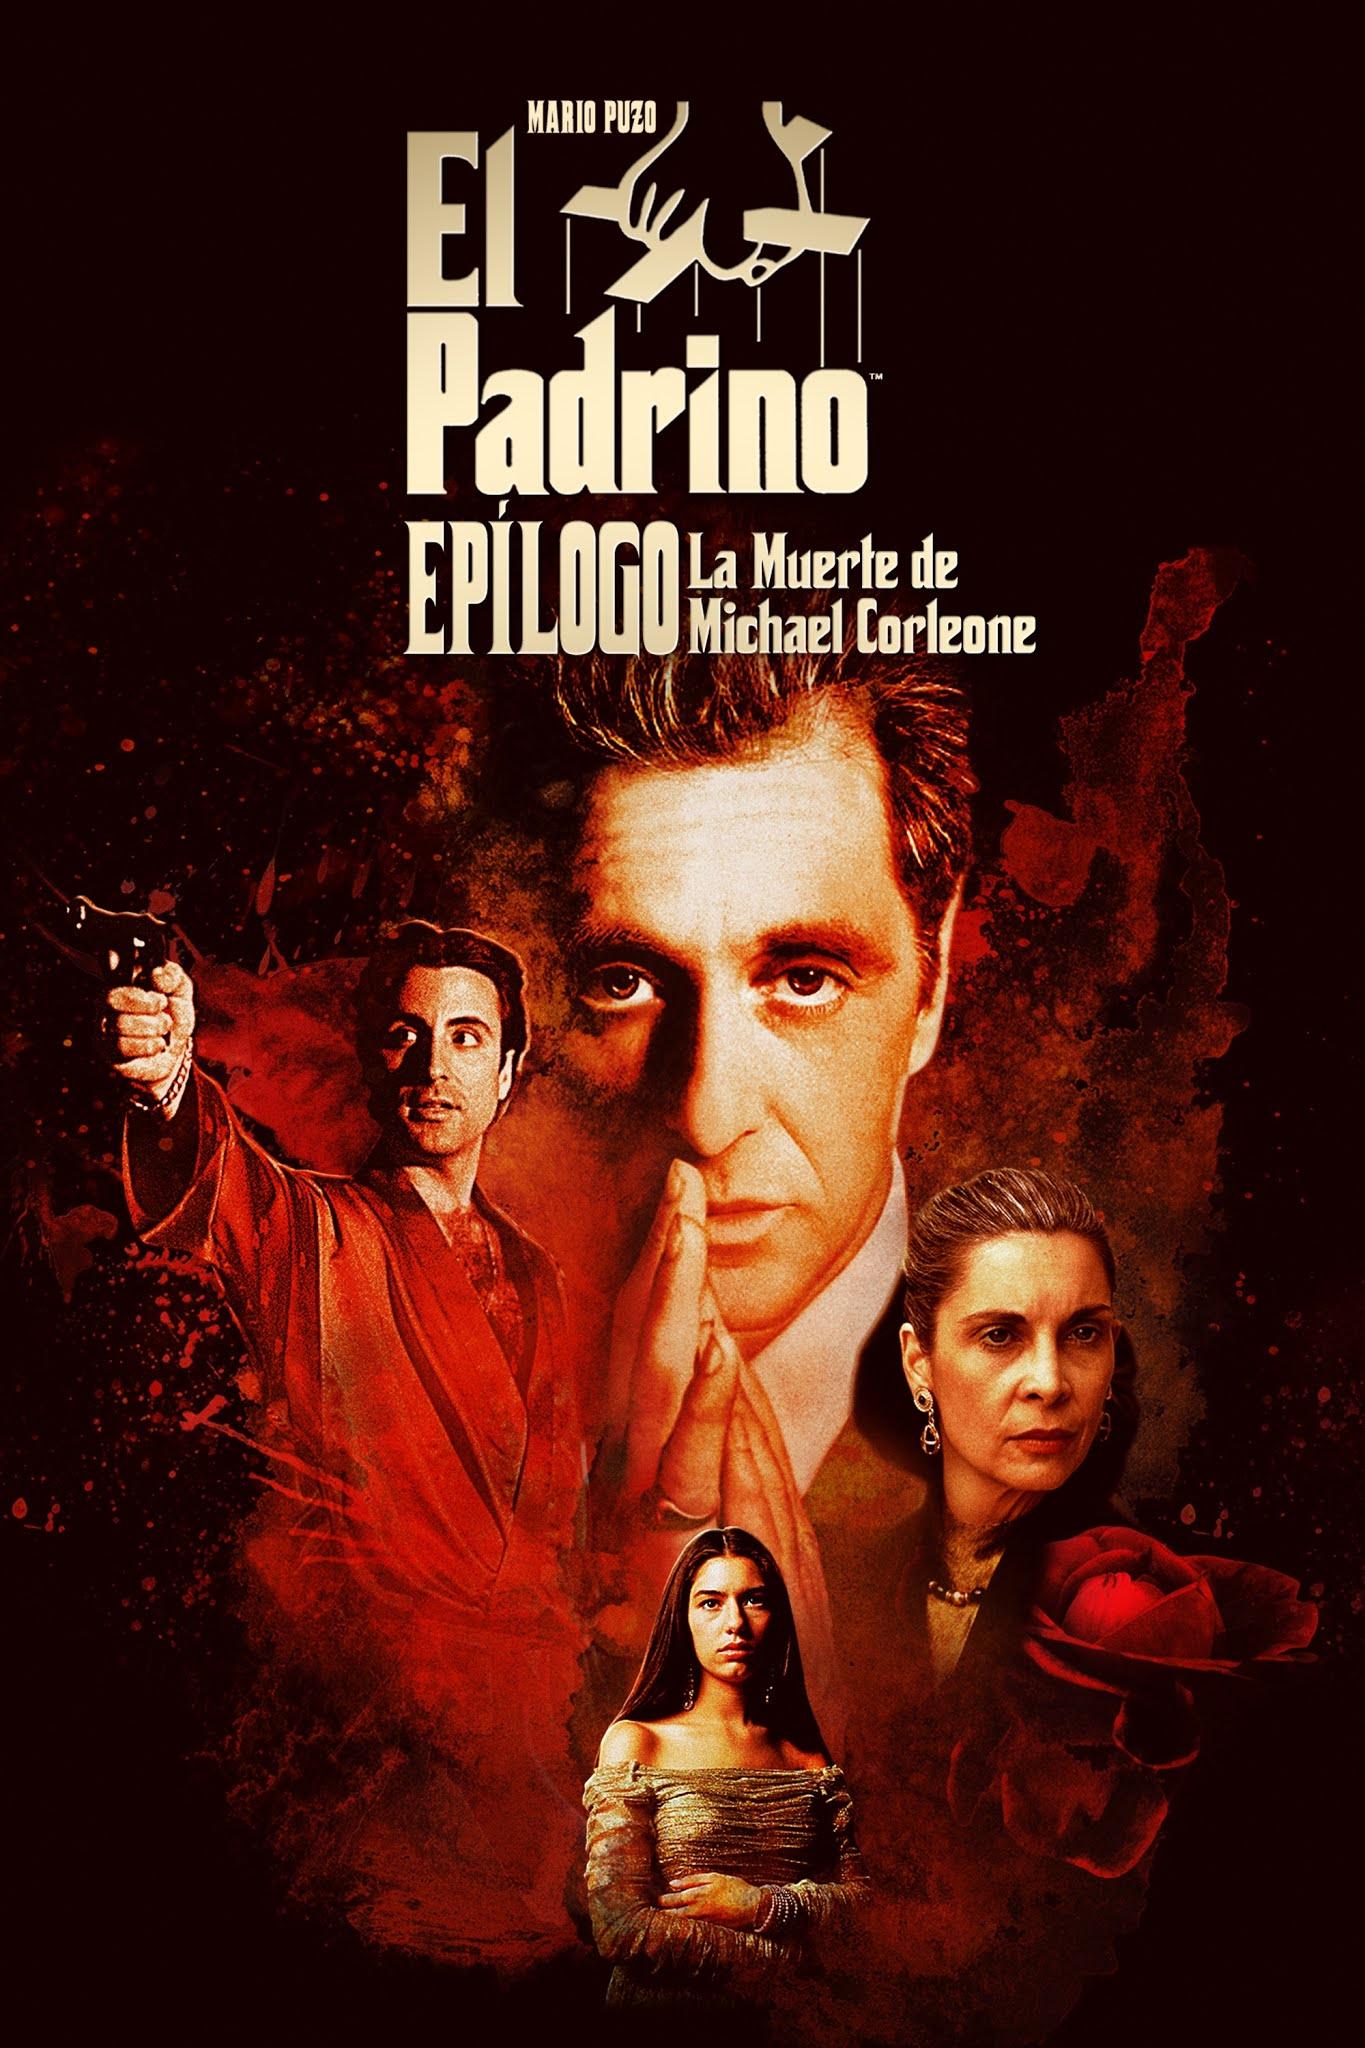 El Padrino Parte III, Epílogo: La muerte de Michael Corleone (1990) Full HD 1080p Latino